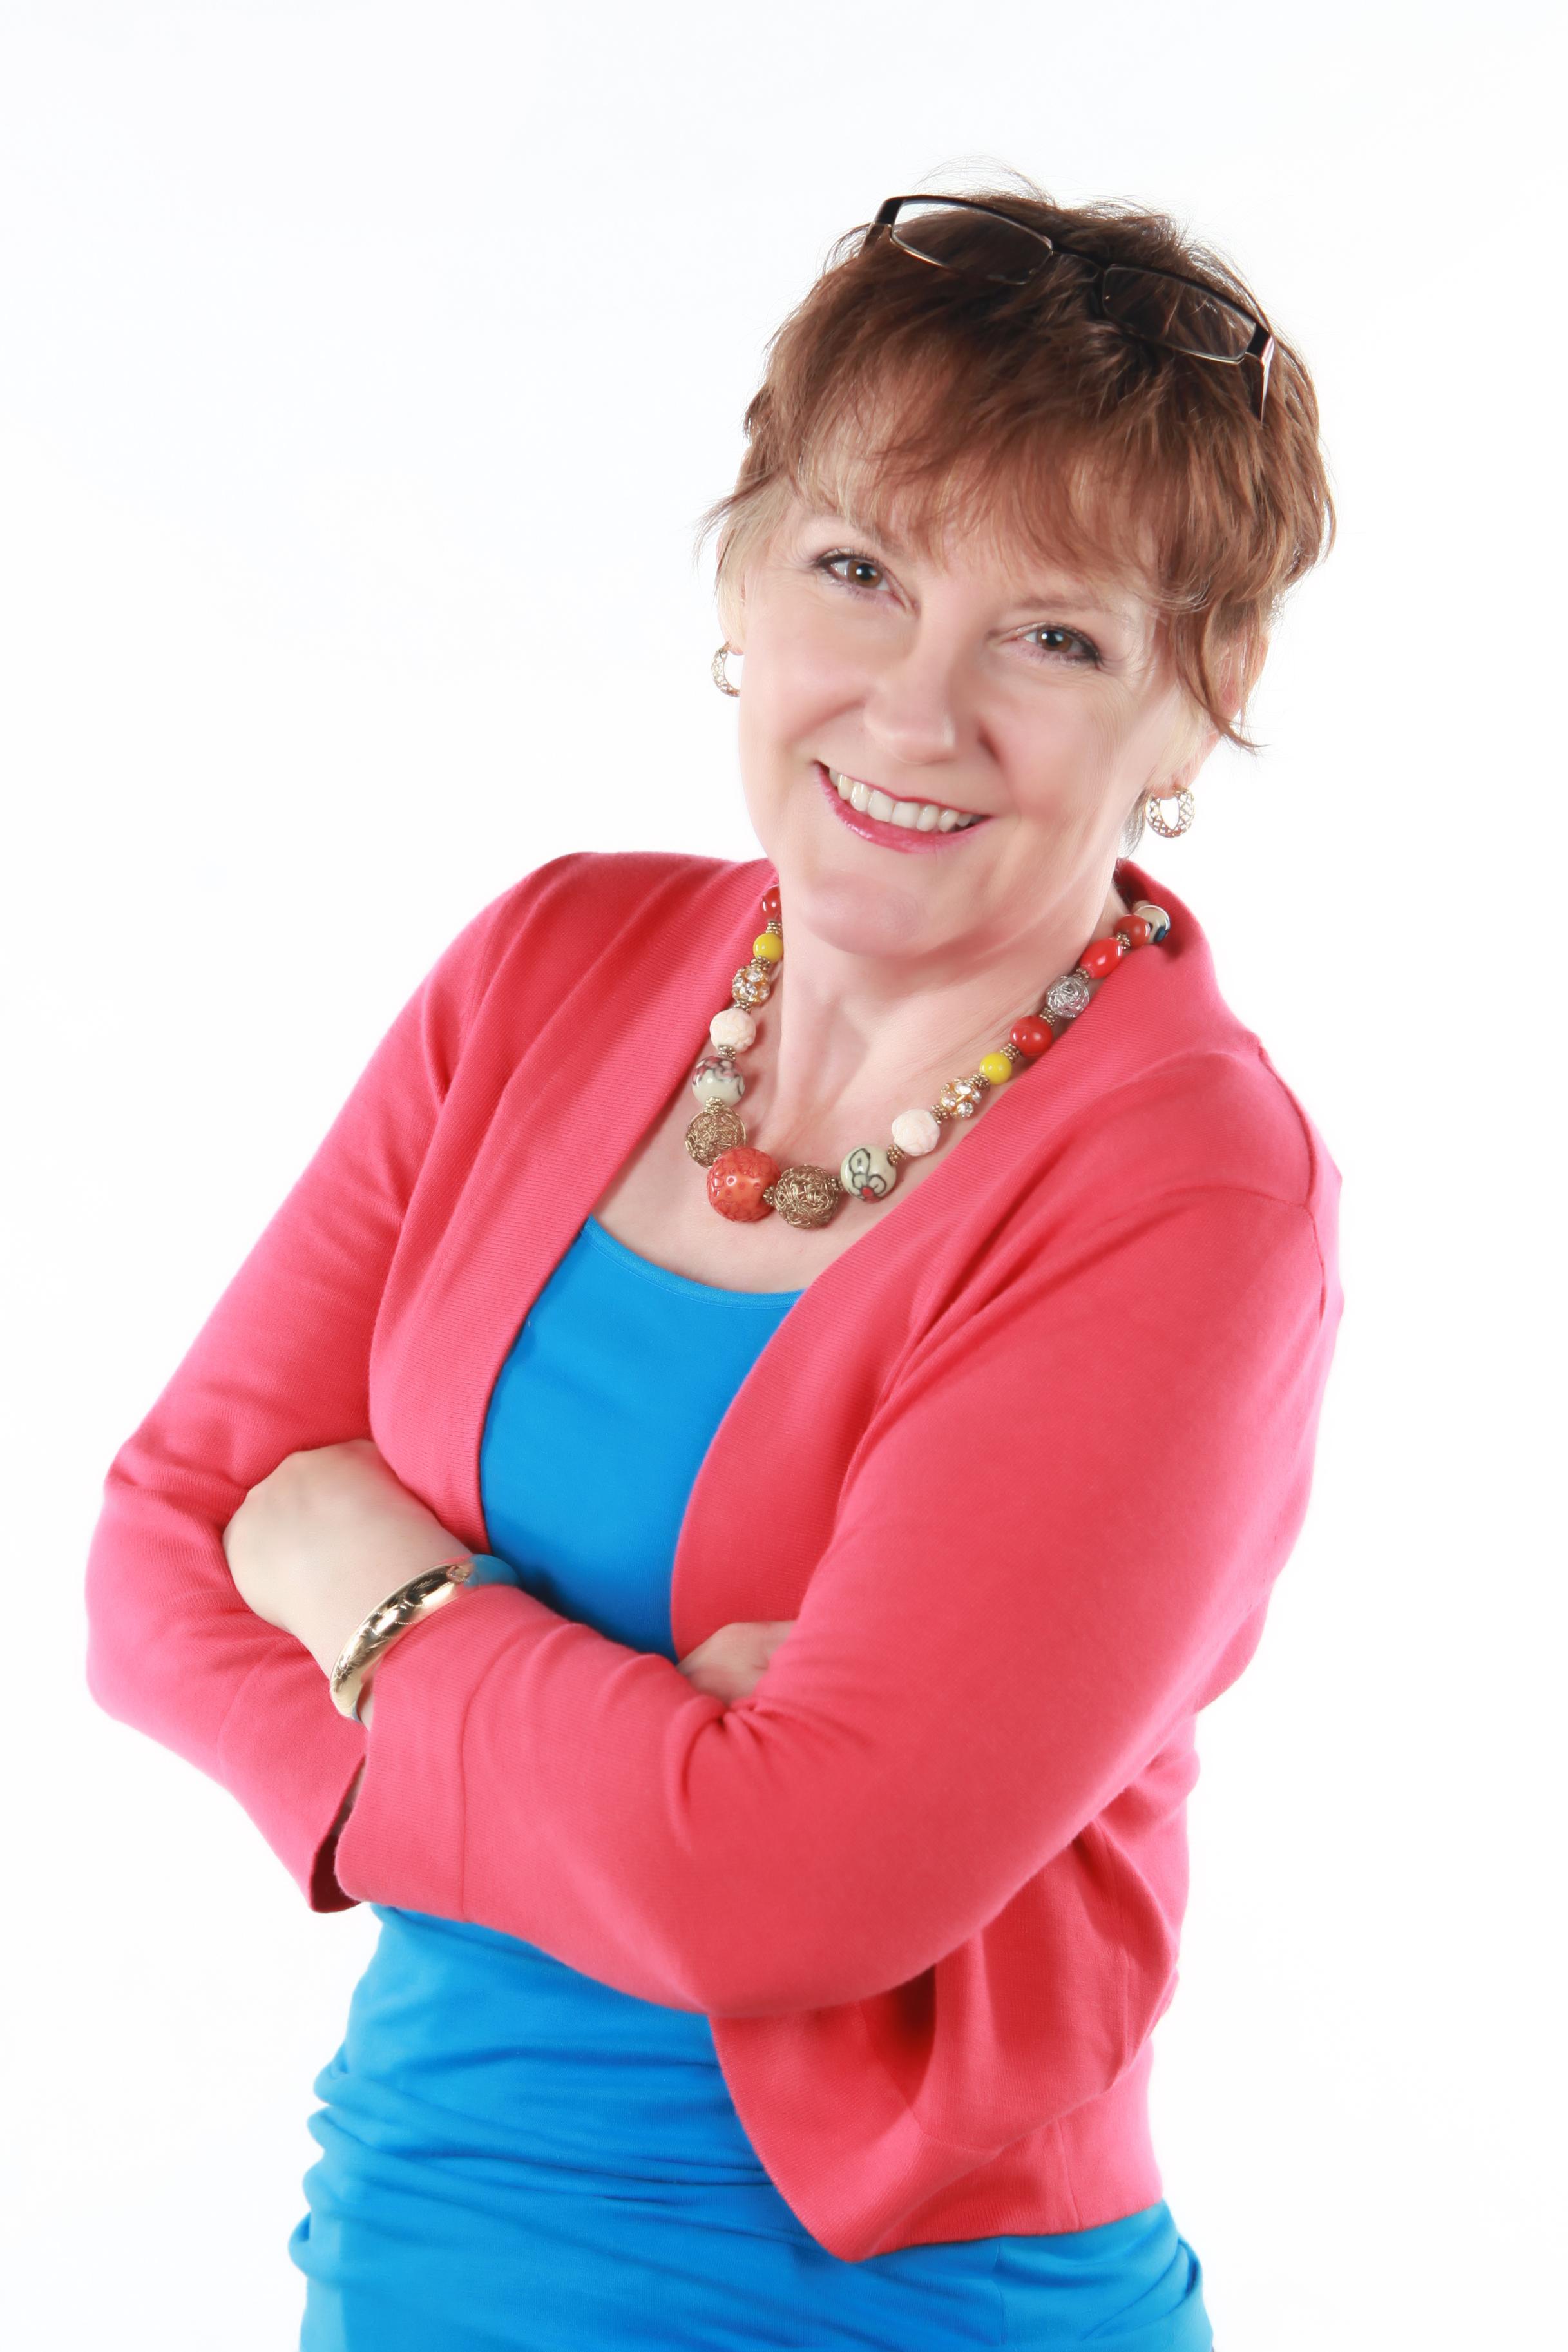 Phyllis Khare | Home phylliskhare.com Keynote Speaker